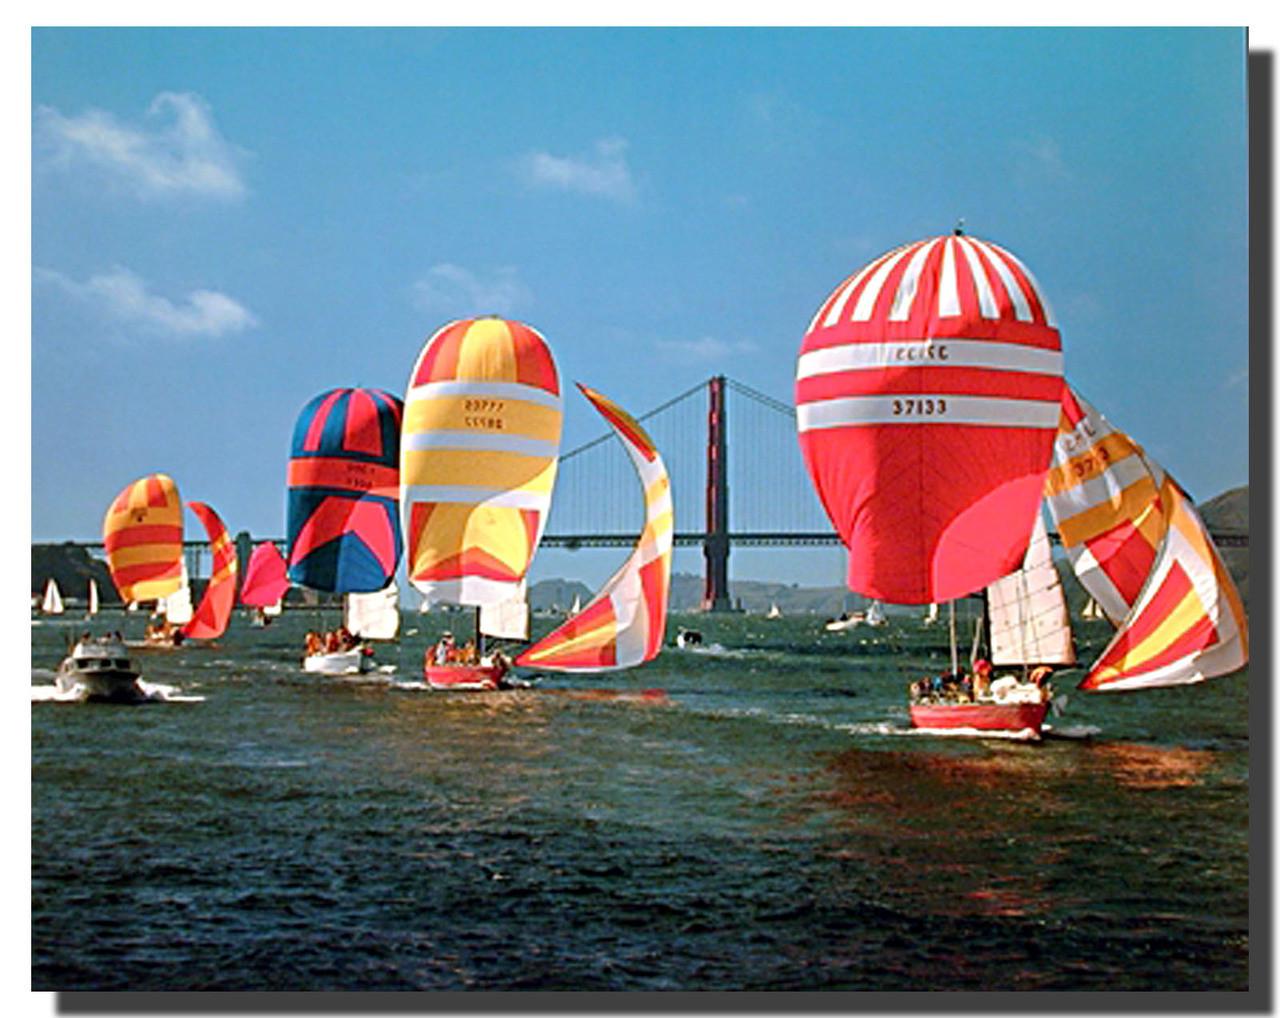 Postereck 3517 Poster /& Canvas Dubrovnik Croatia Ocean City Harbour Boats